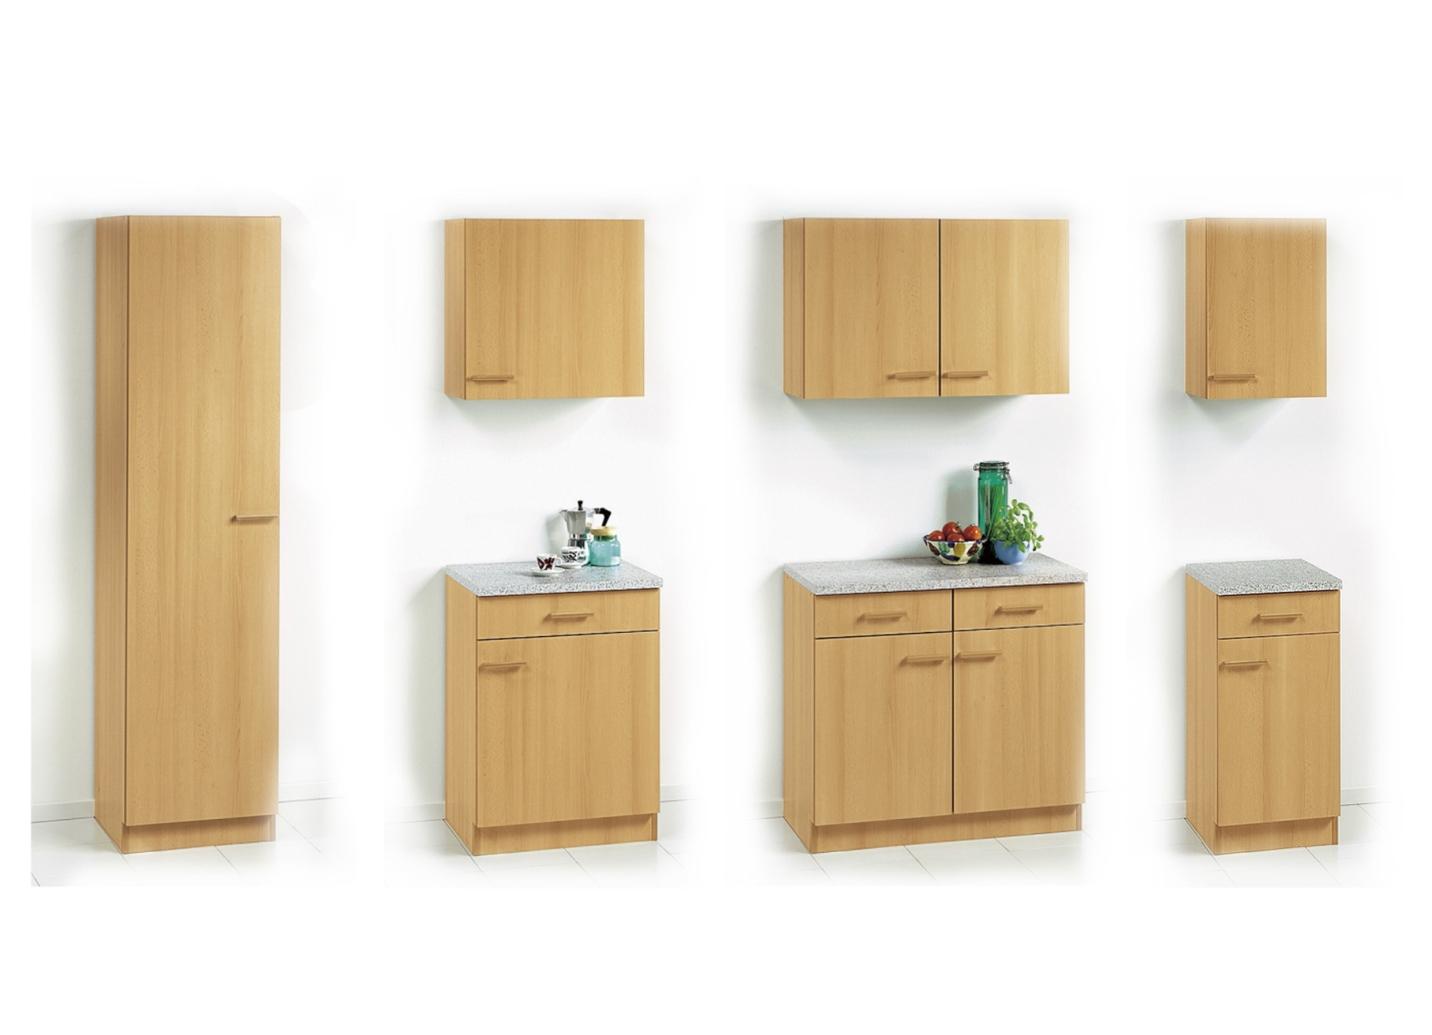 k chenm bel verschiedene ausf hrungen k chenm bel bader. Black Bedroom Furniture Sets. Home Design Ideas